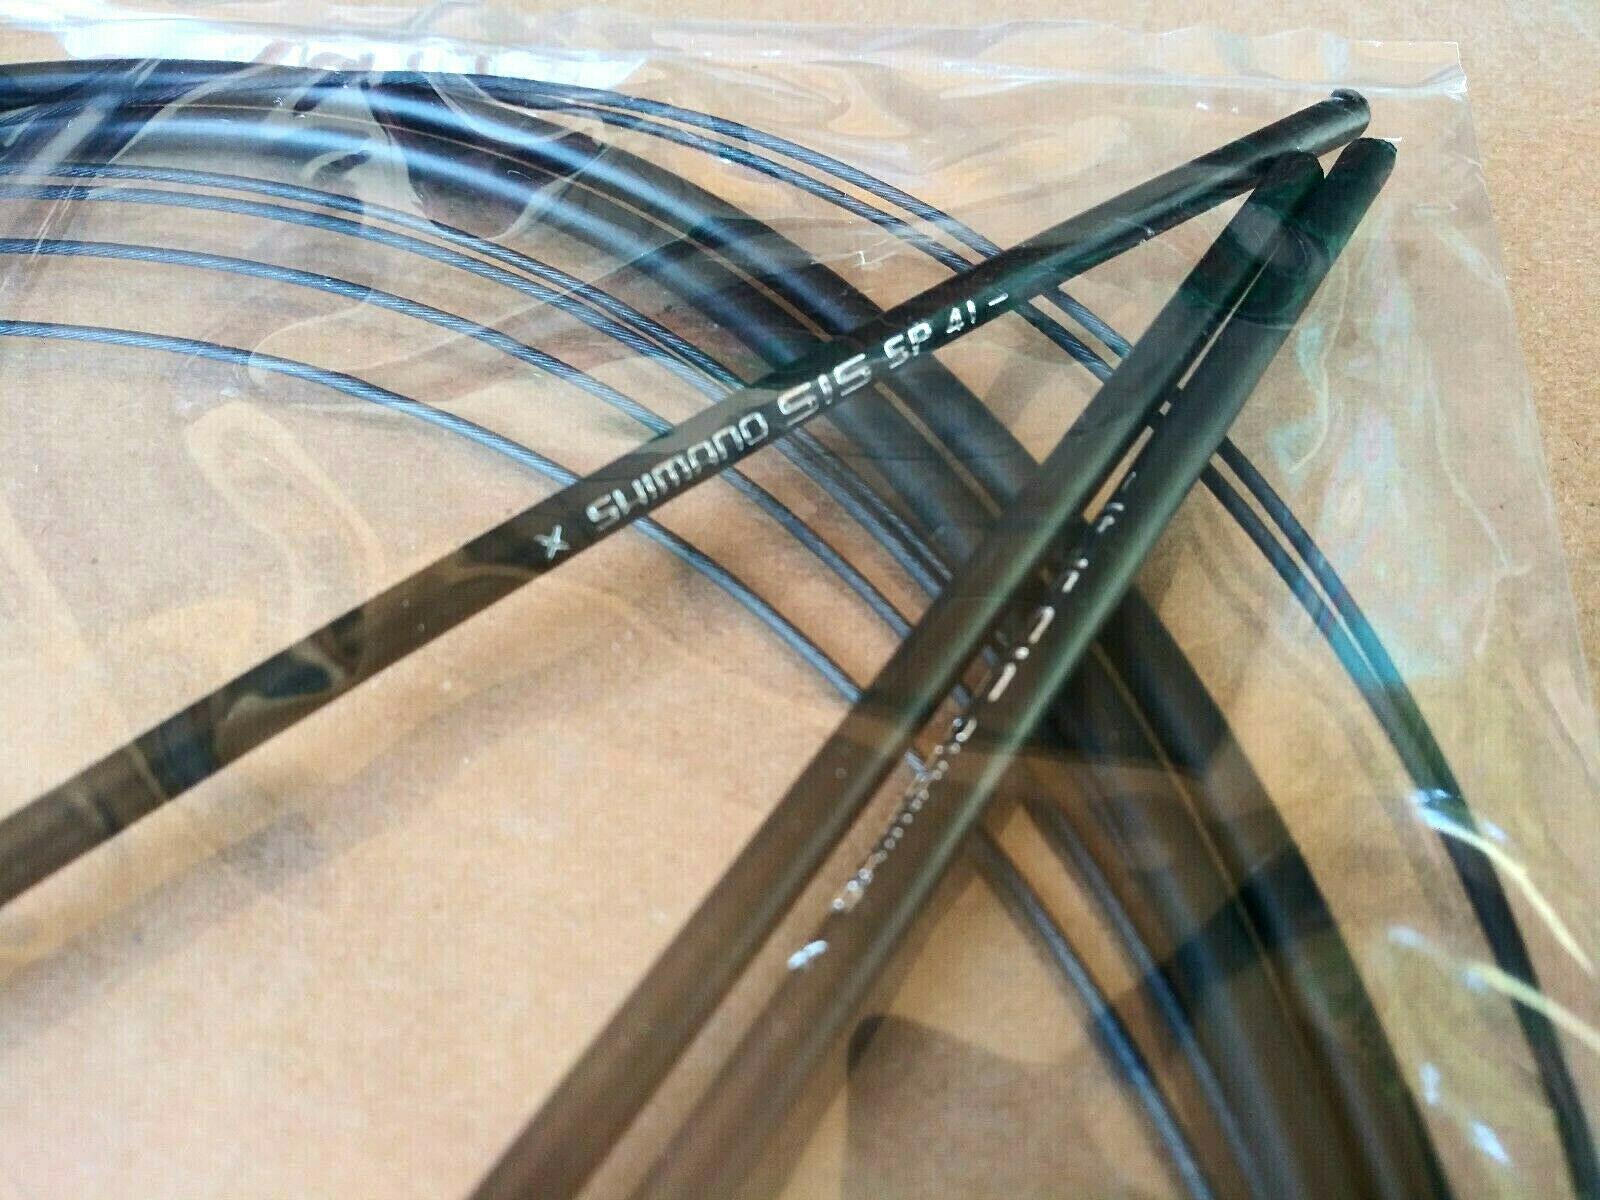 NOS Shimano XTR M970 Shift Cable /& Housing ATB Shifting Cable Set SIS-SP41